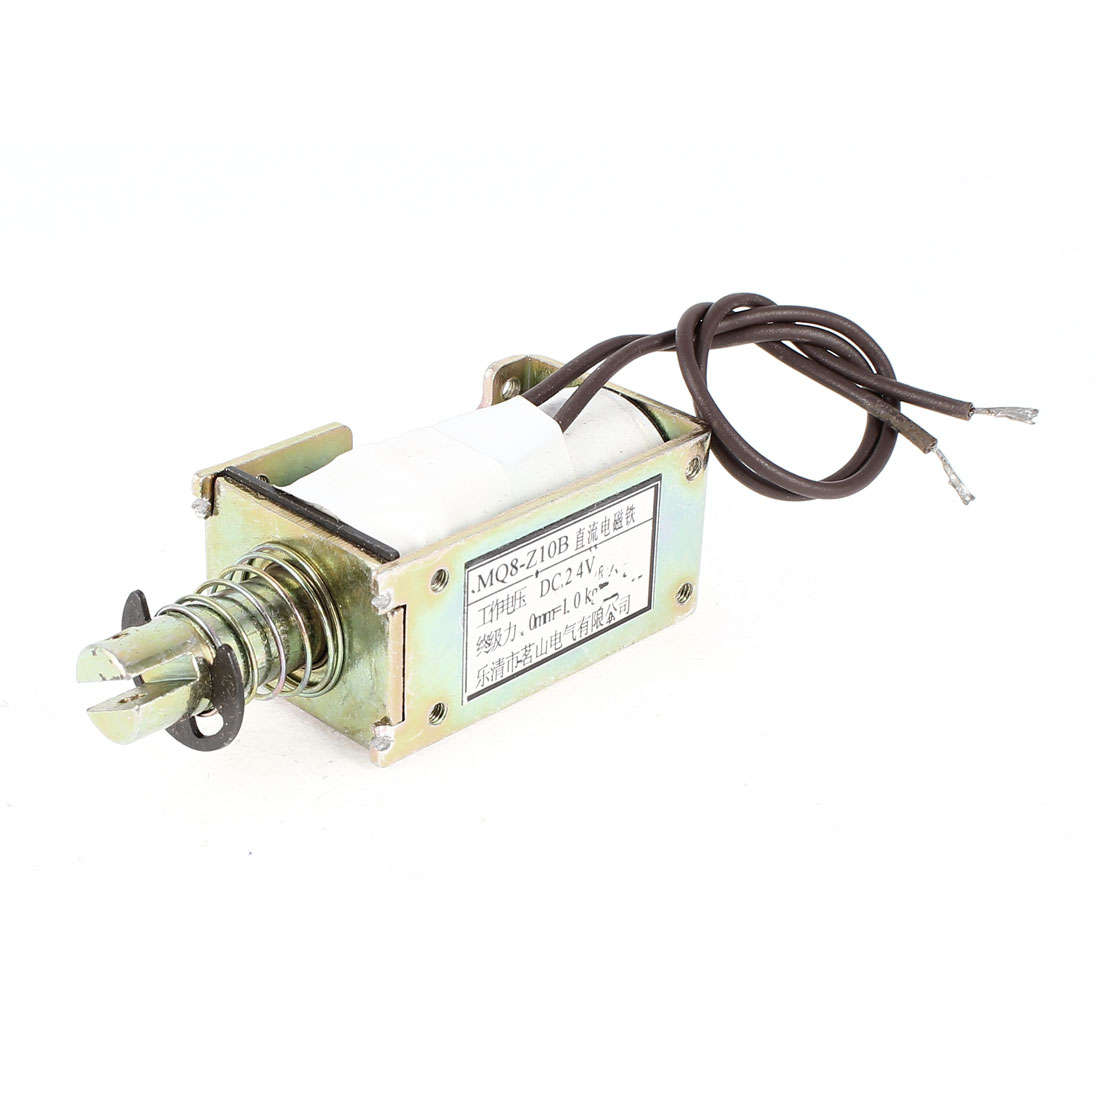 24V 0mm 1kg Push Pull Type Open Frame Spring Plunger Linear Motion DC Solenoid Electromagnet